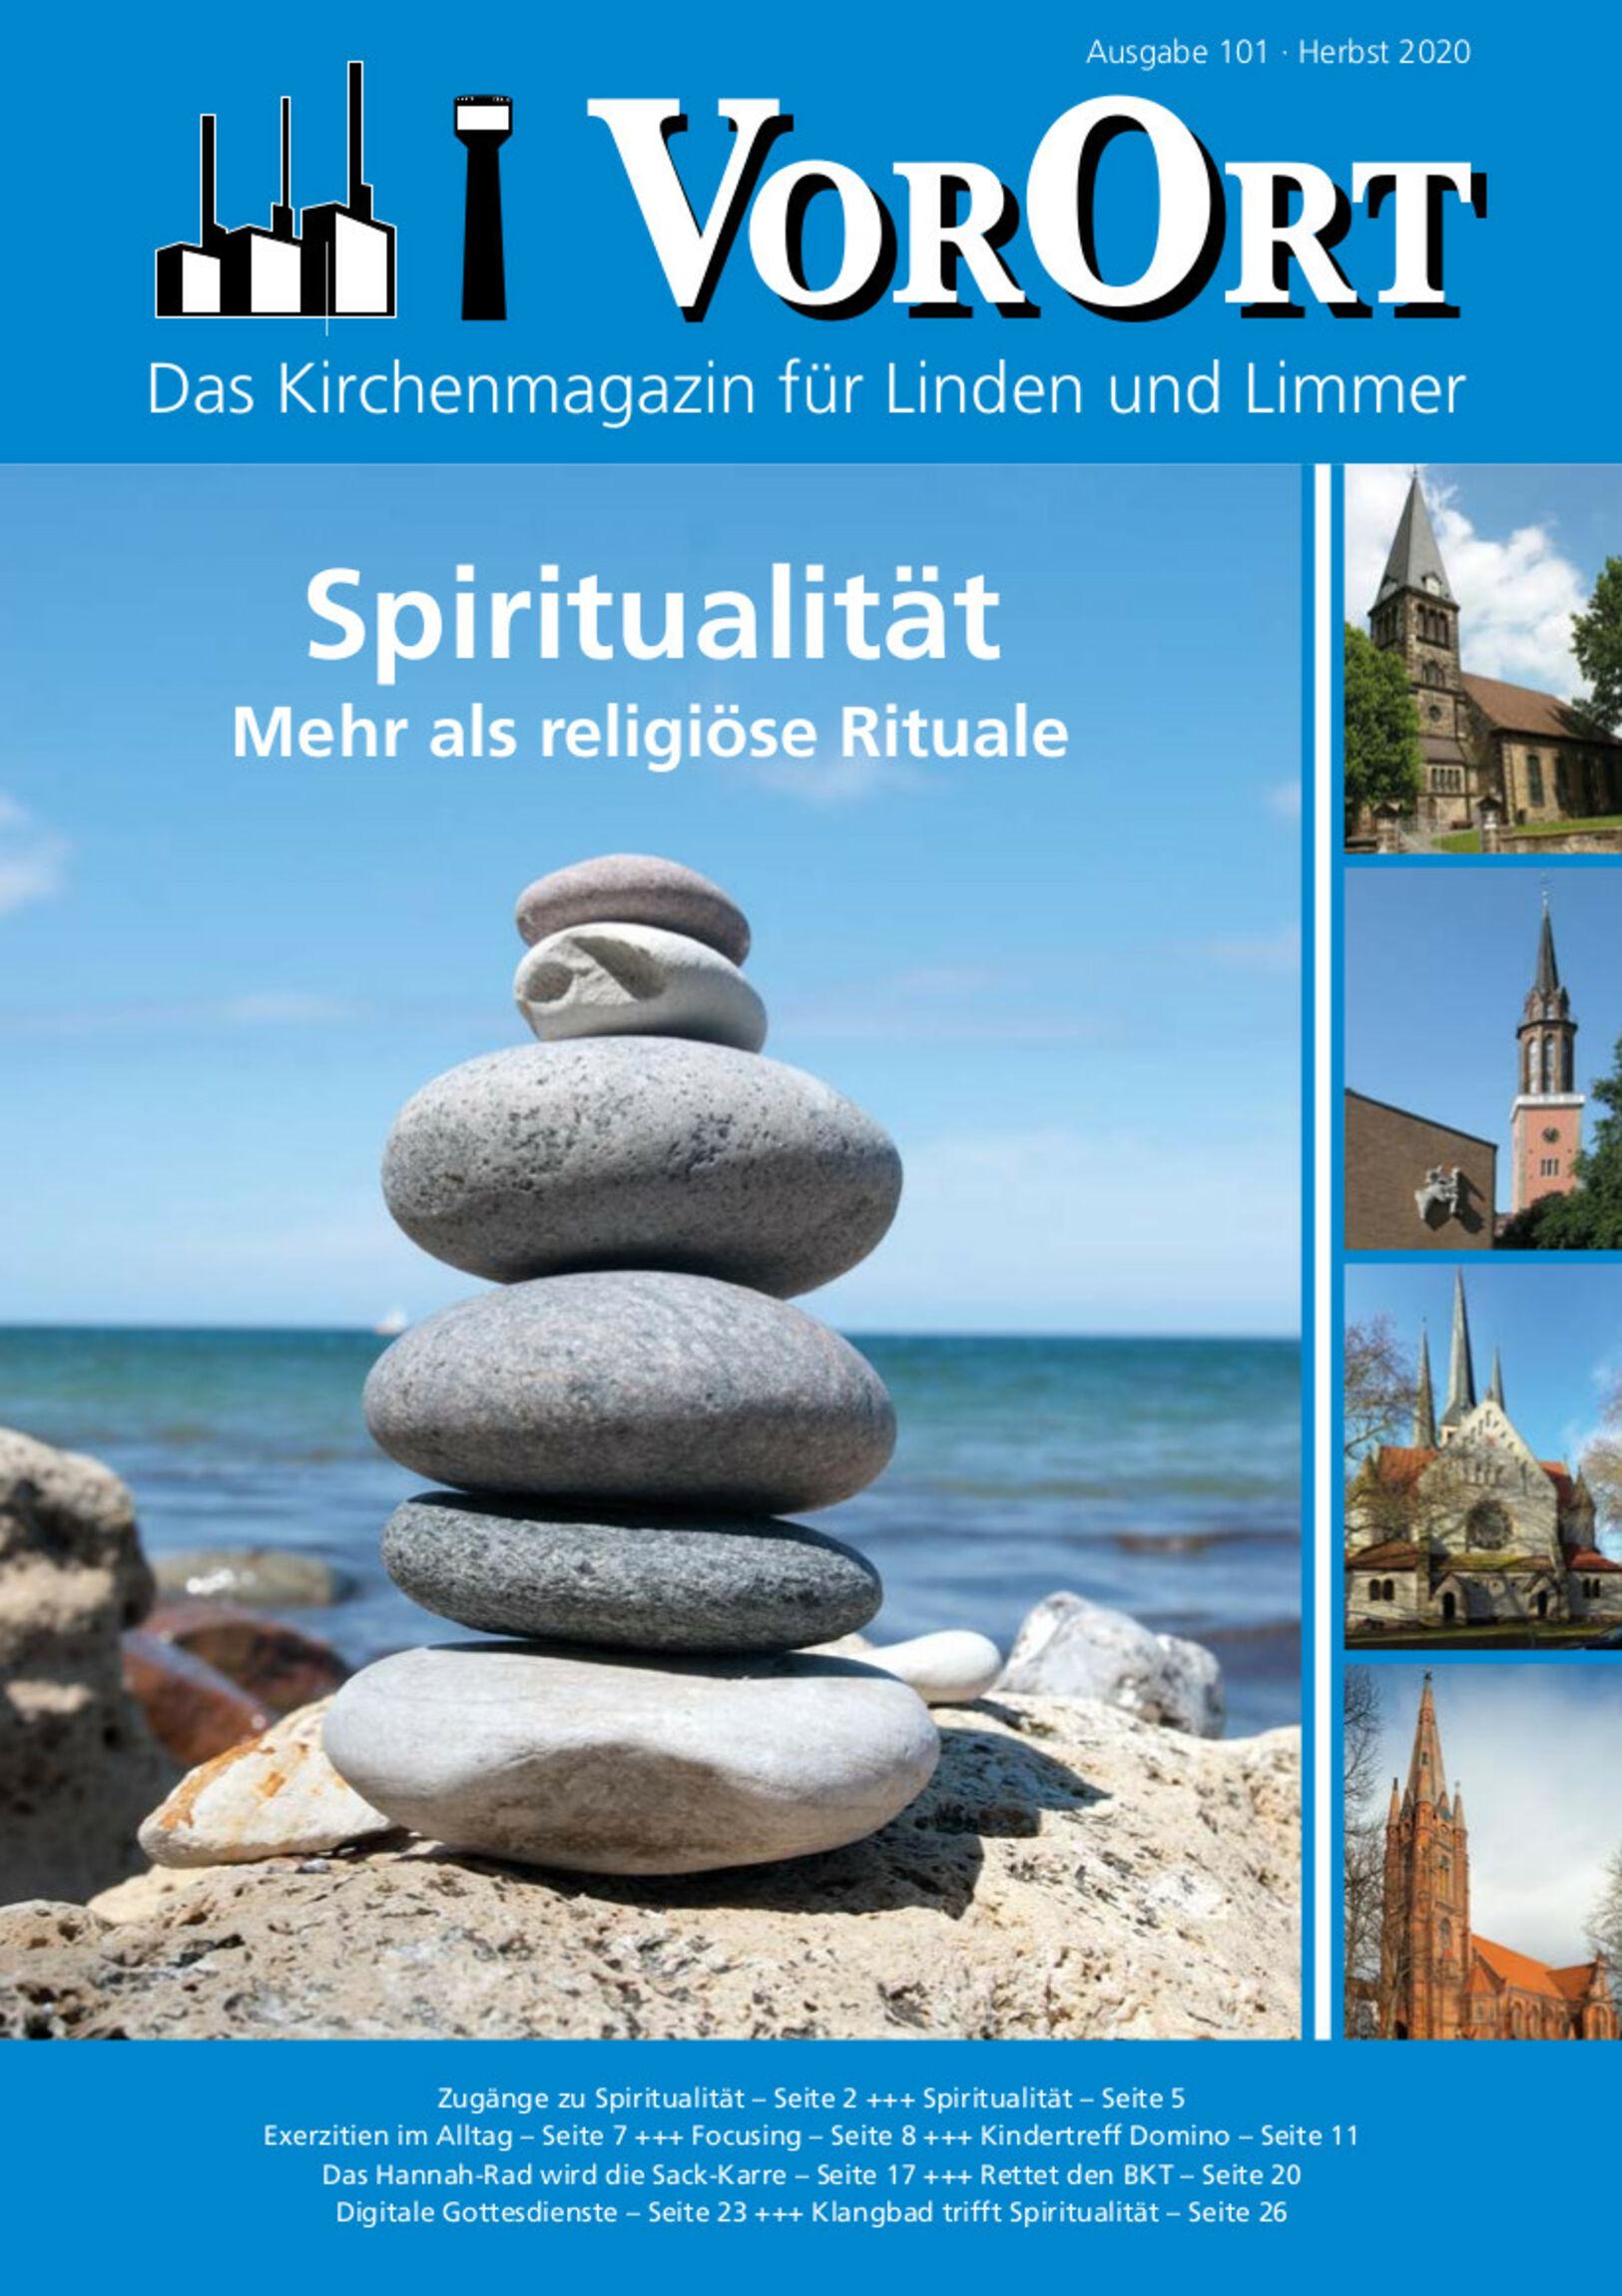 VorOrt 101 Titelblatt - Herbst 2020